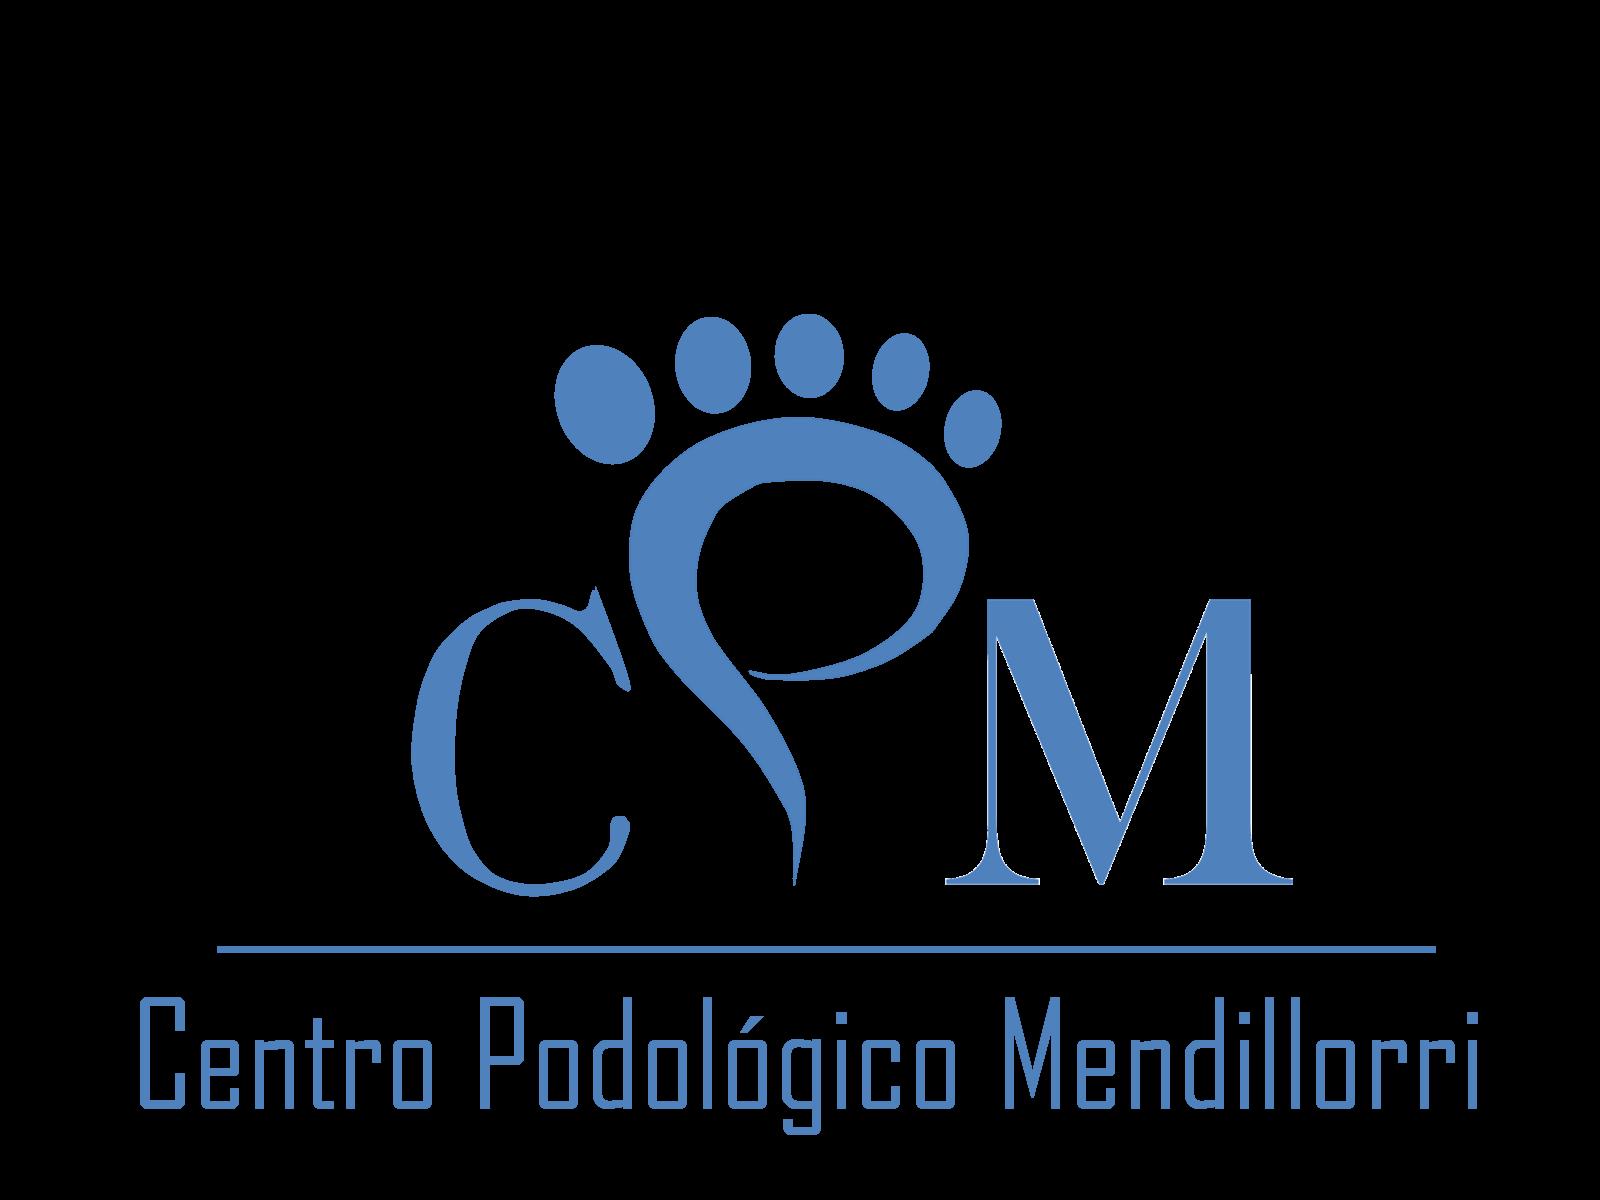 Centro Podológico Mendillorri